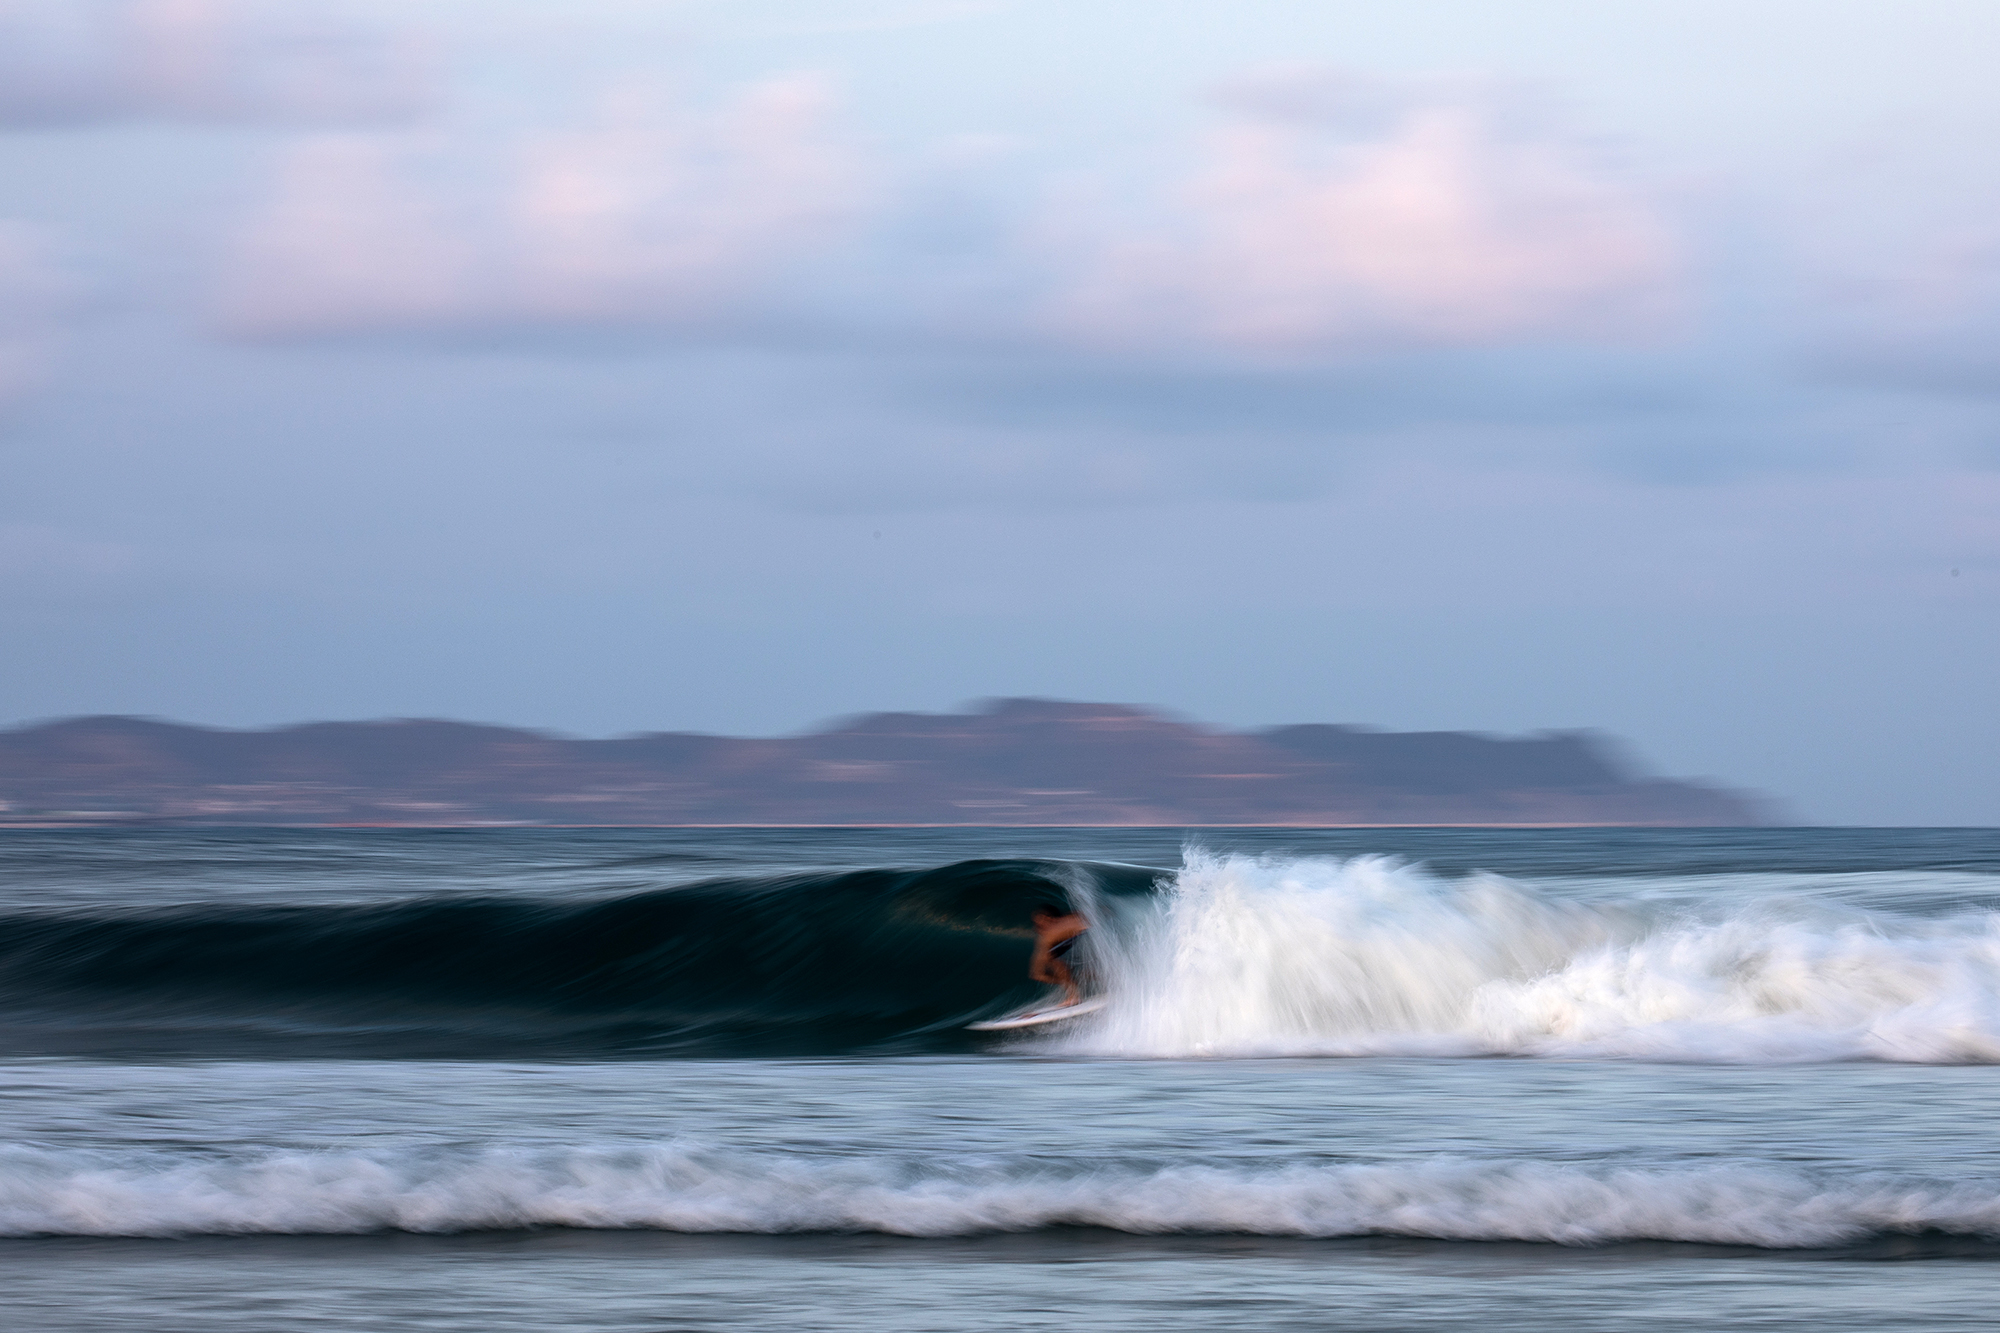 Rip Curl, Surfline, Tom Curran, Free Scrubber,